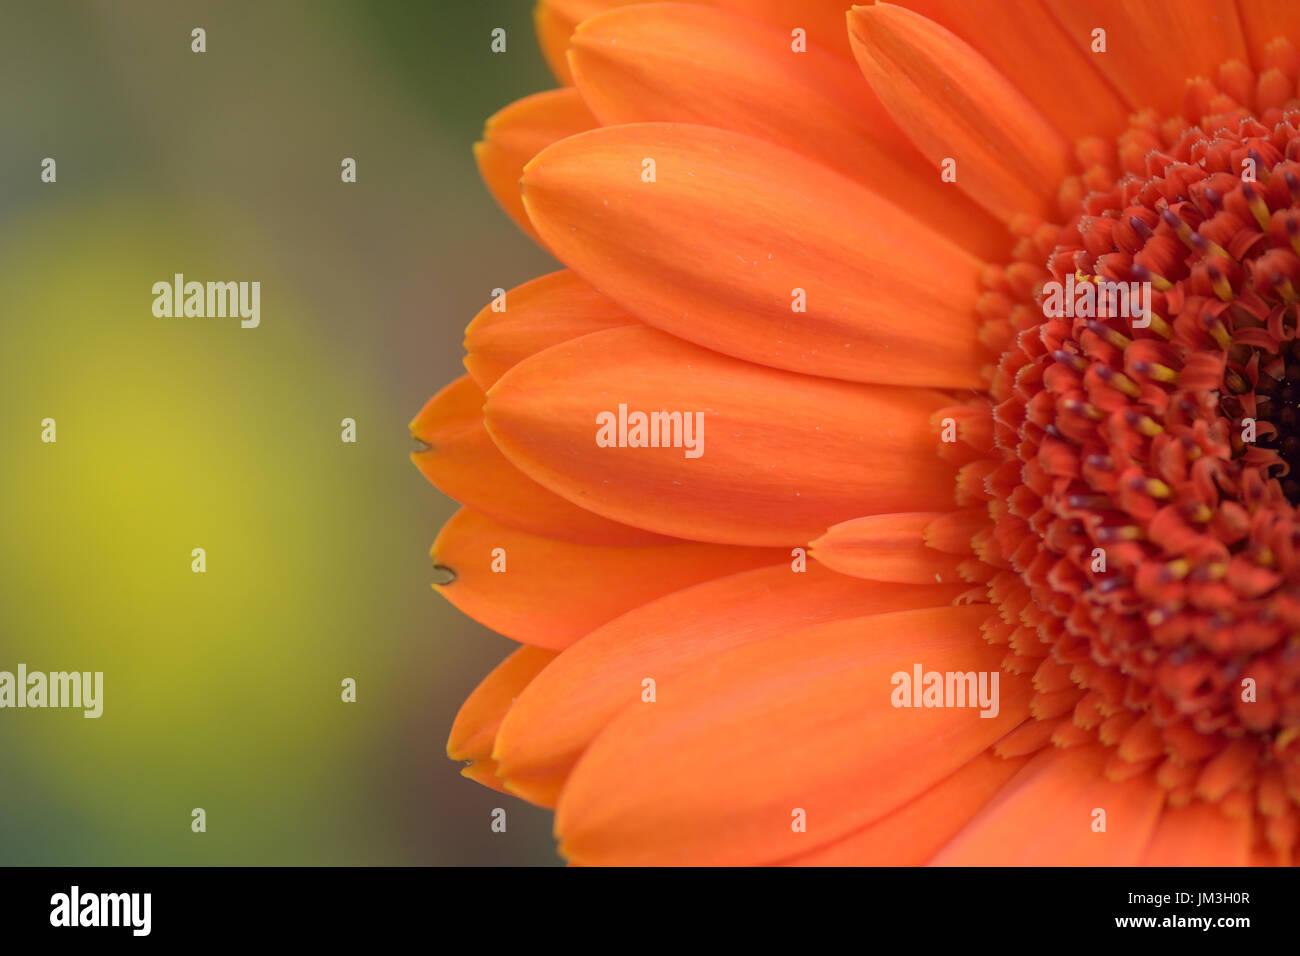 Macro details of orange colored Daisy flower in horizontal frame - Stock Image